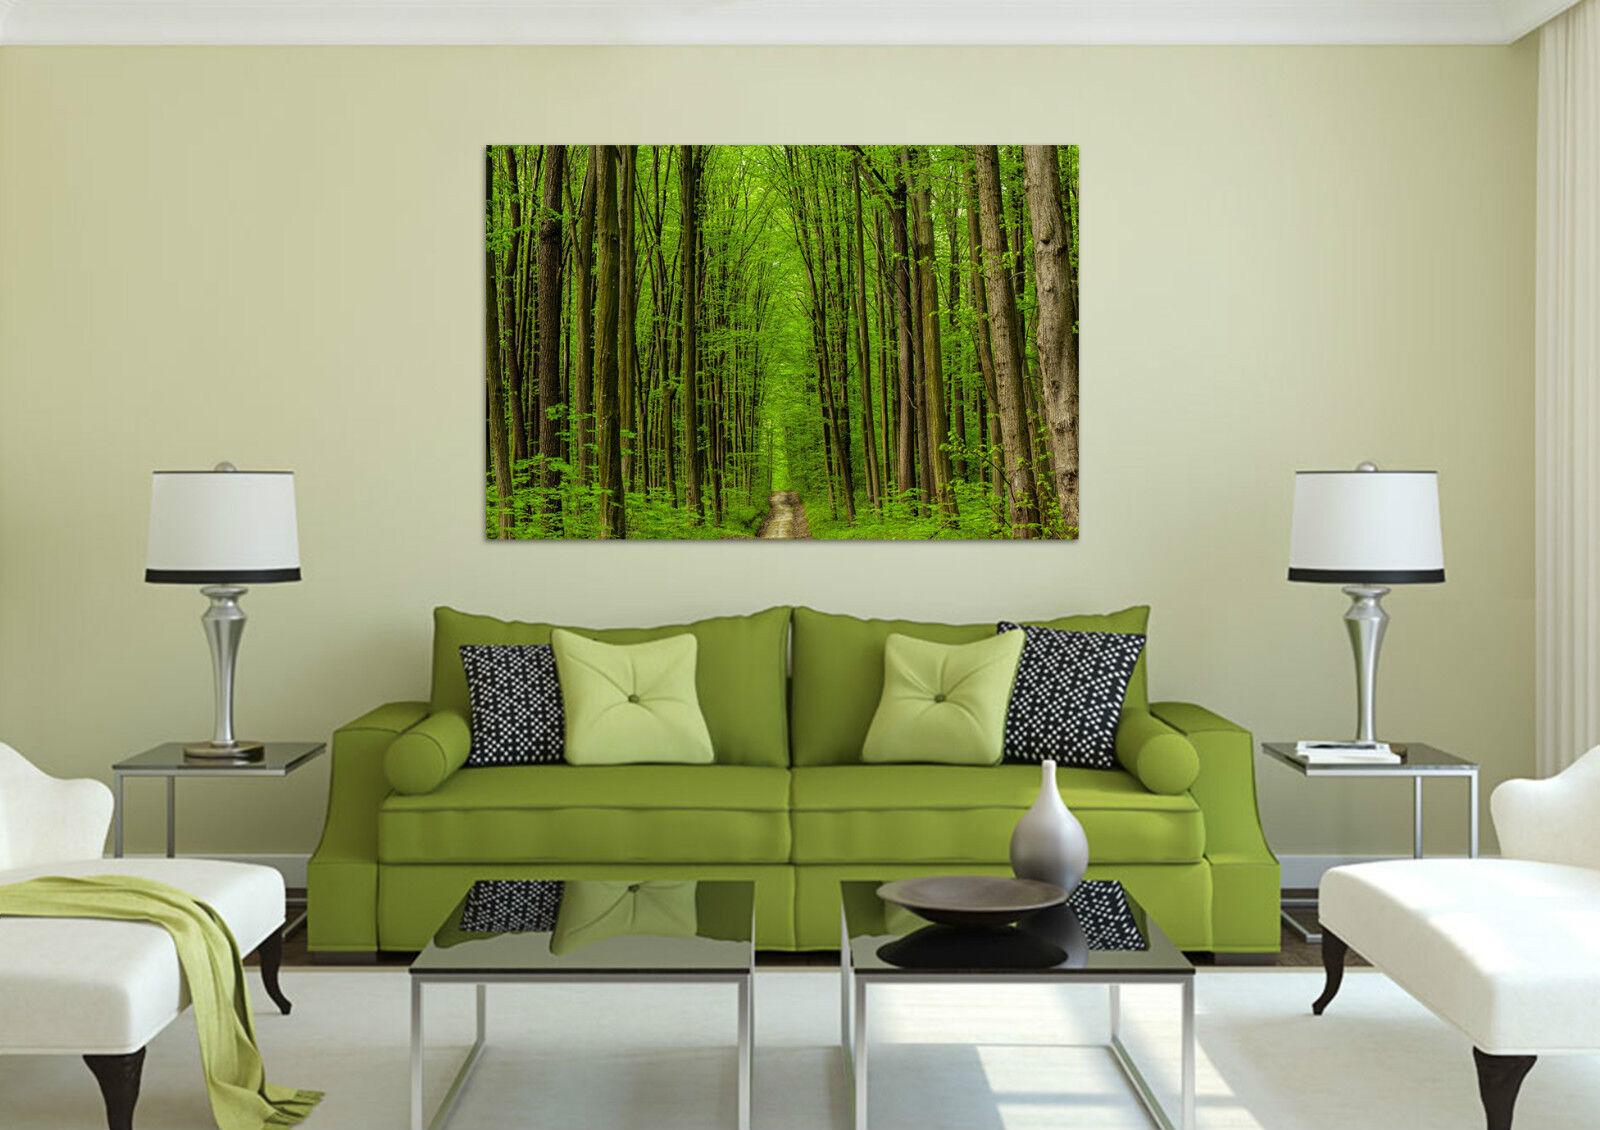 3D Grüne Bäume 423 Fototapeten Wandbild BildTapete AJSTORE DE Lemon